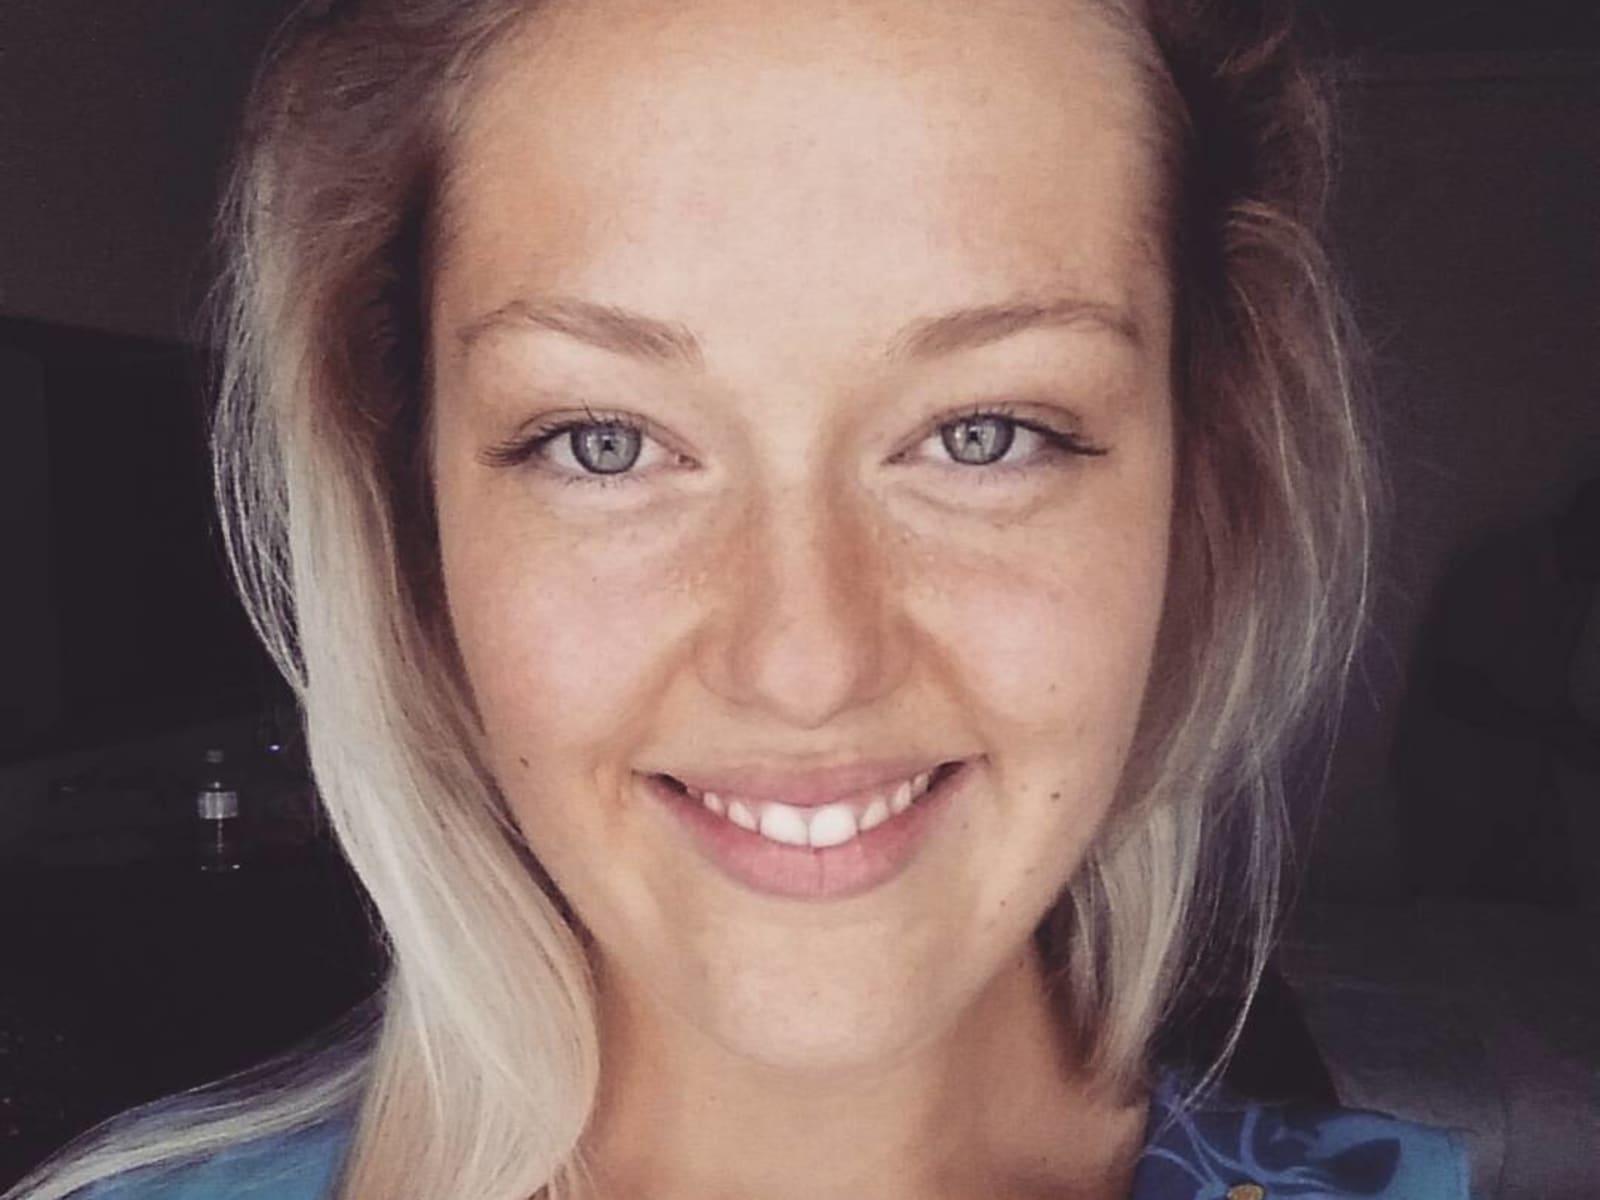 Ariella from Canberra, Australian Capital Territory, Australia